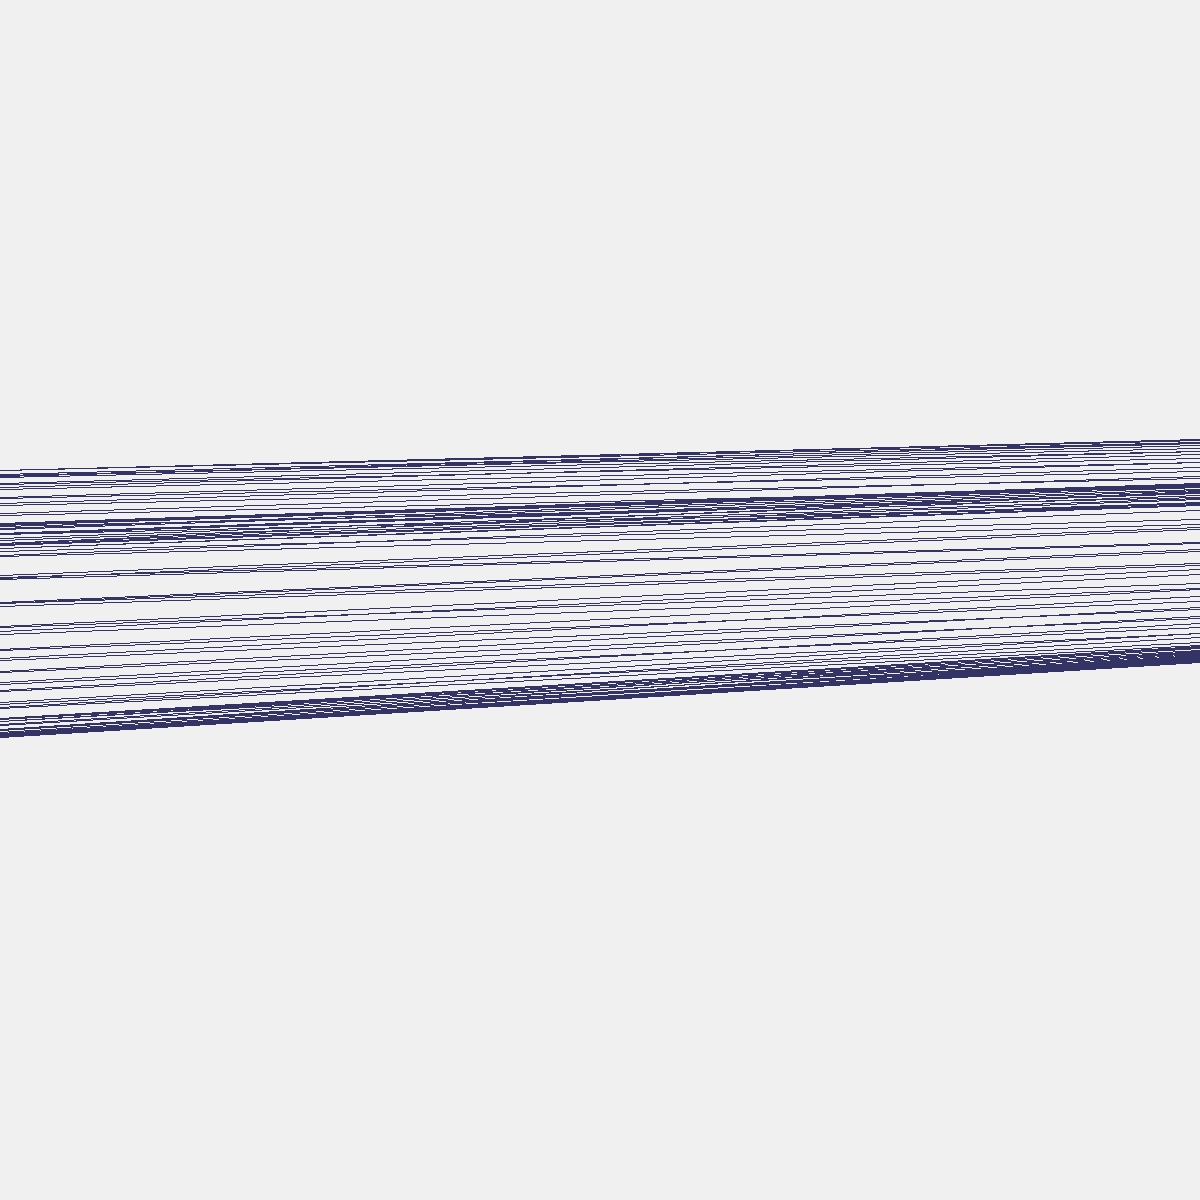 aerobee 170 rocket 3d model 3ds dxf fbx blend cob dae x  obj 166051